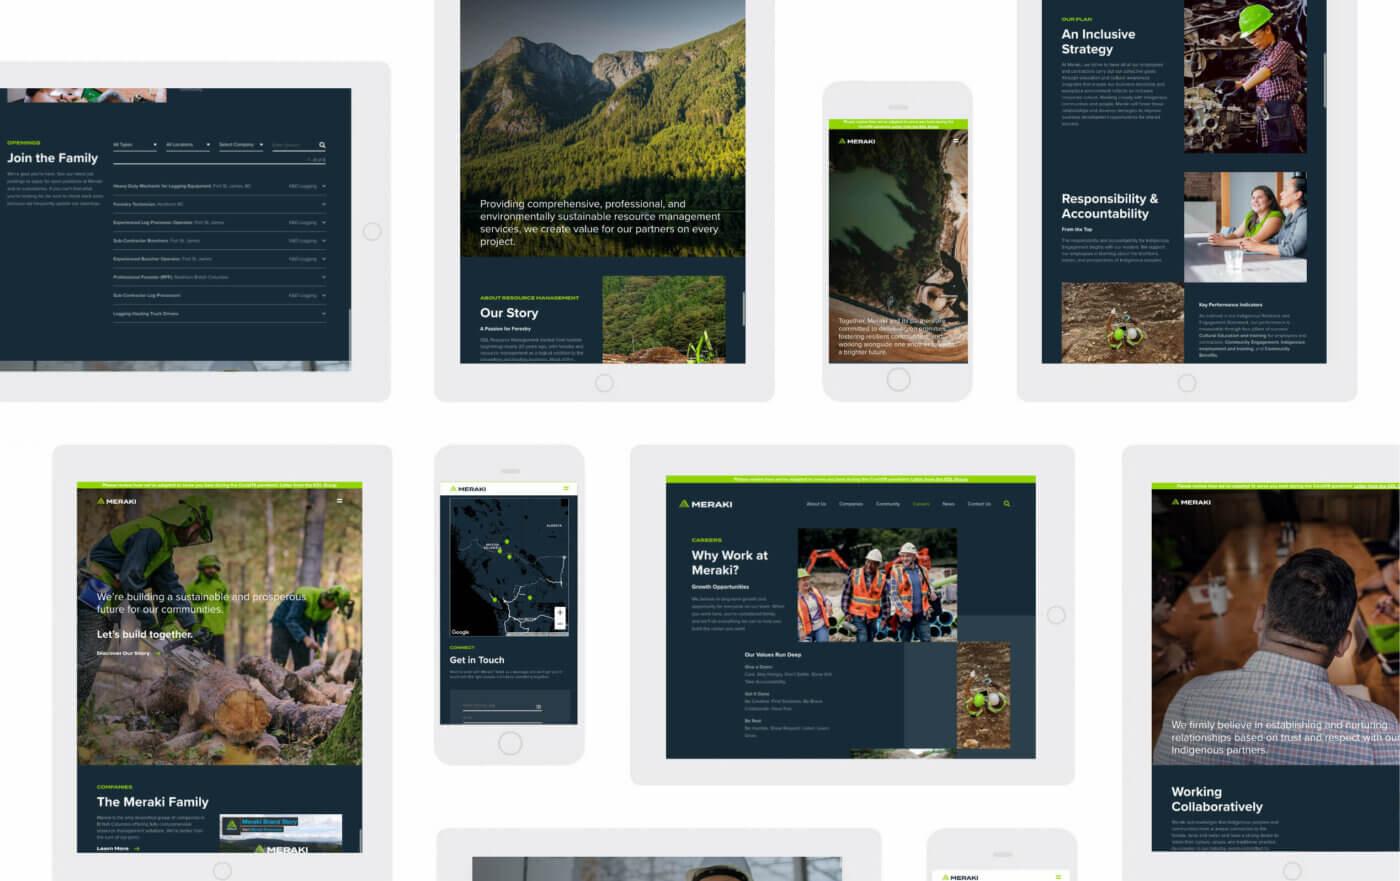 Website design screens from our Meraki website design project